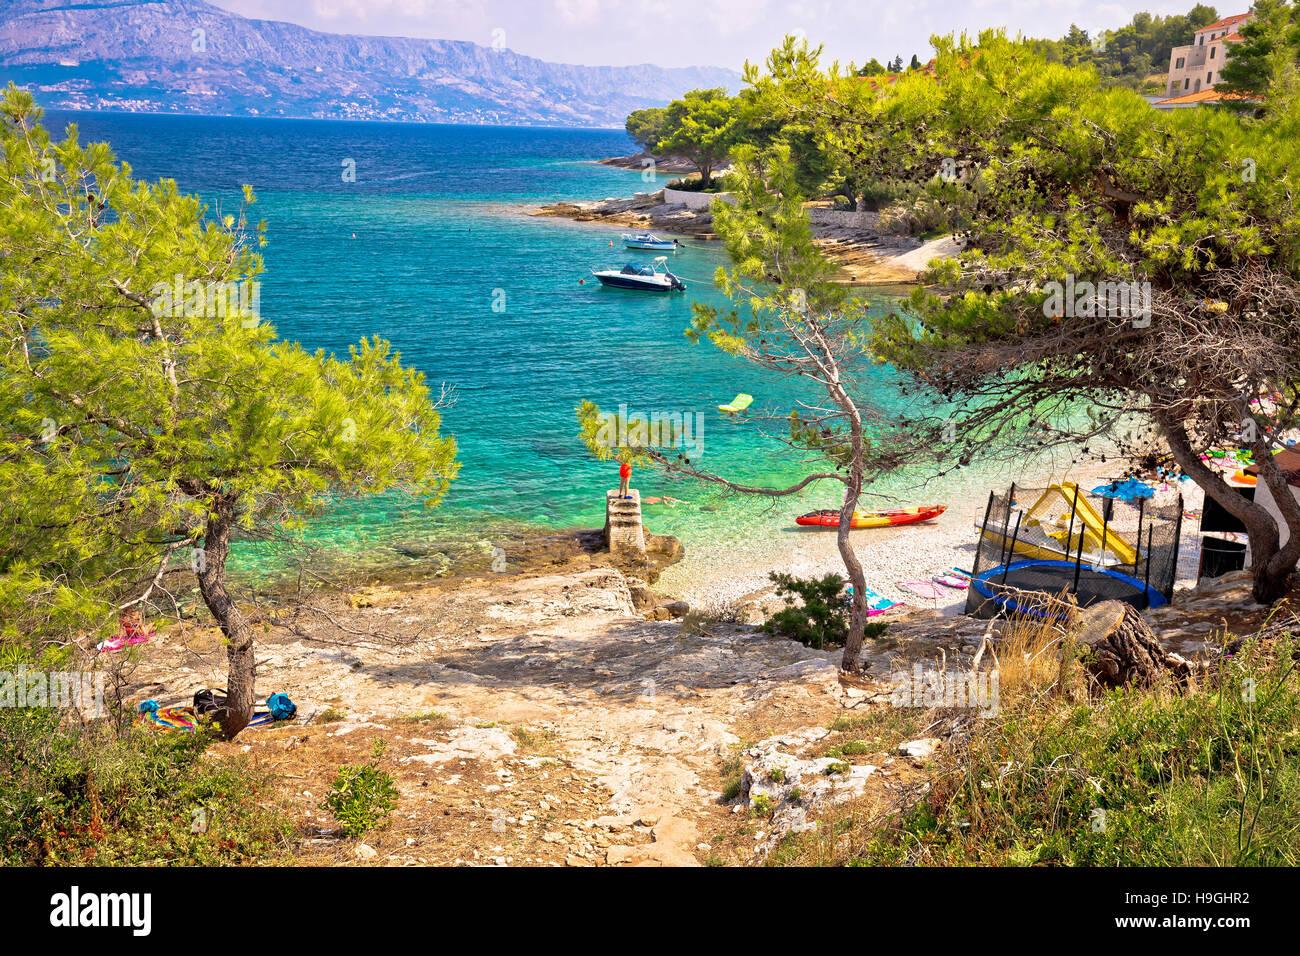 Turquoise beach in pine trees on Brac island, Dalmatia, Croatia - Stock Image